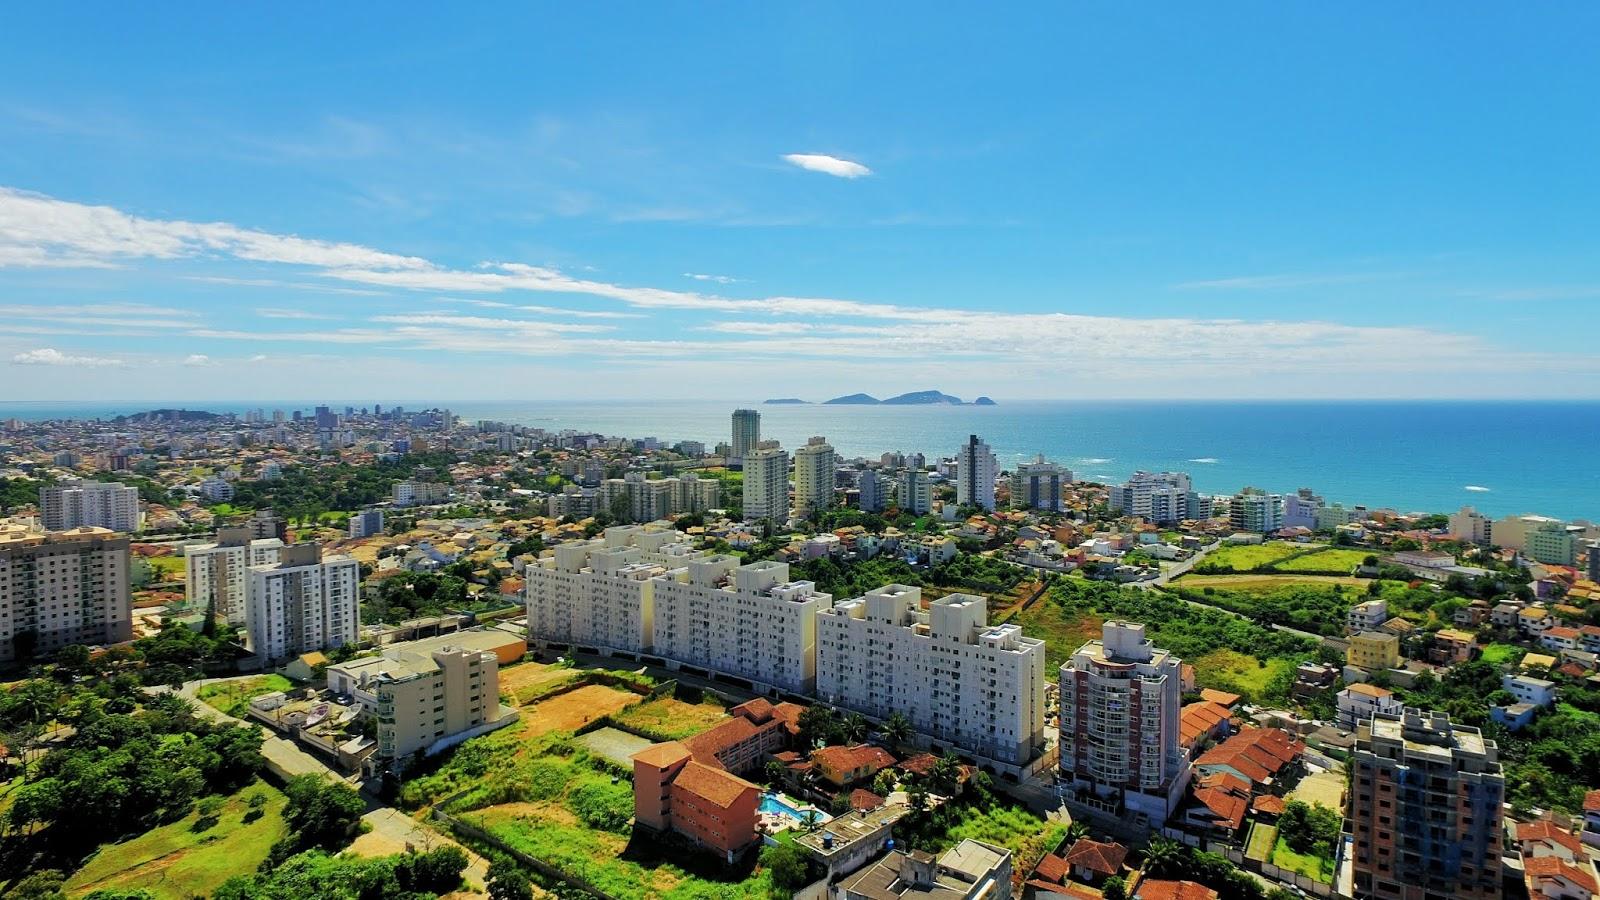 Macaé | Rio de Janeiro